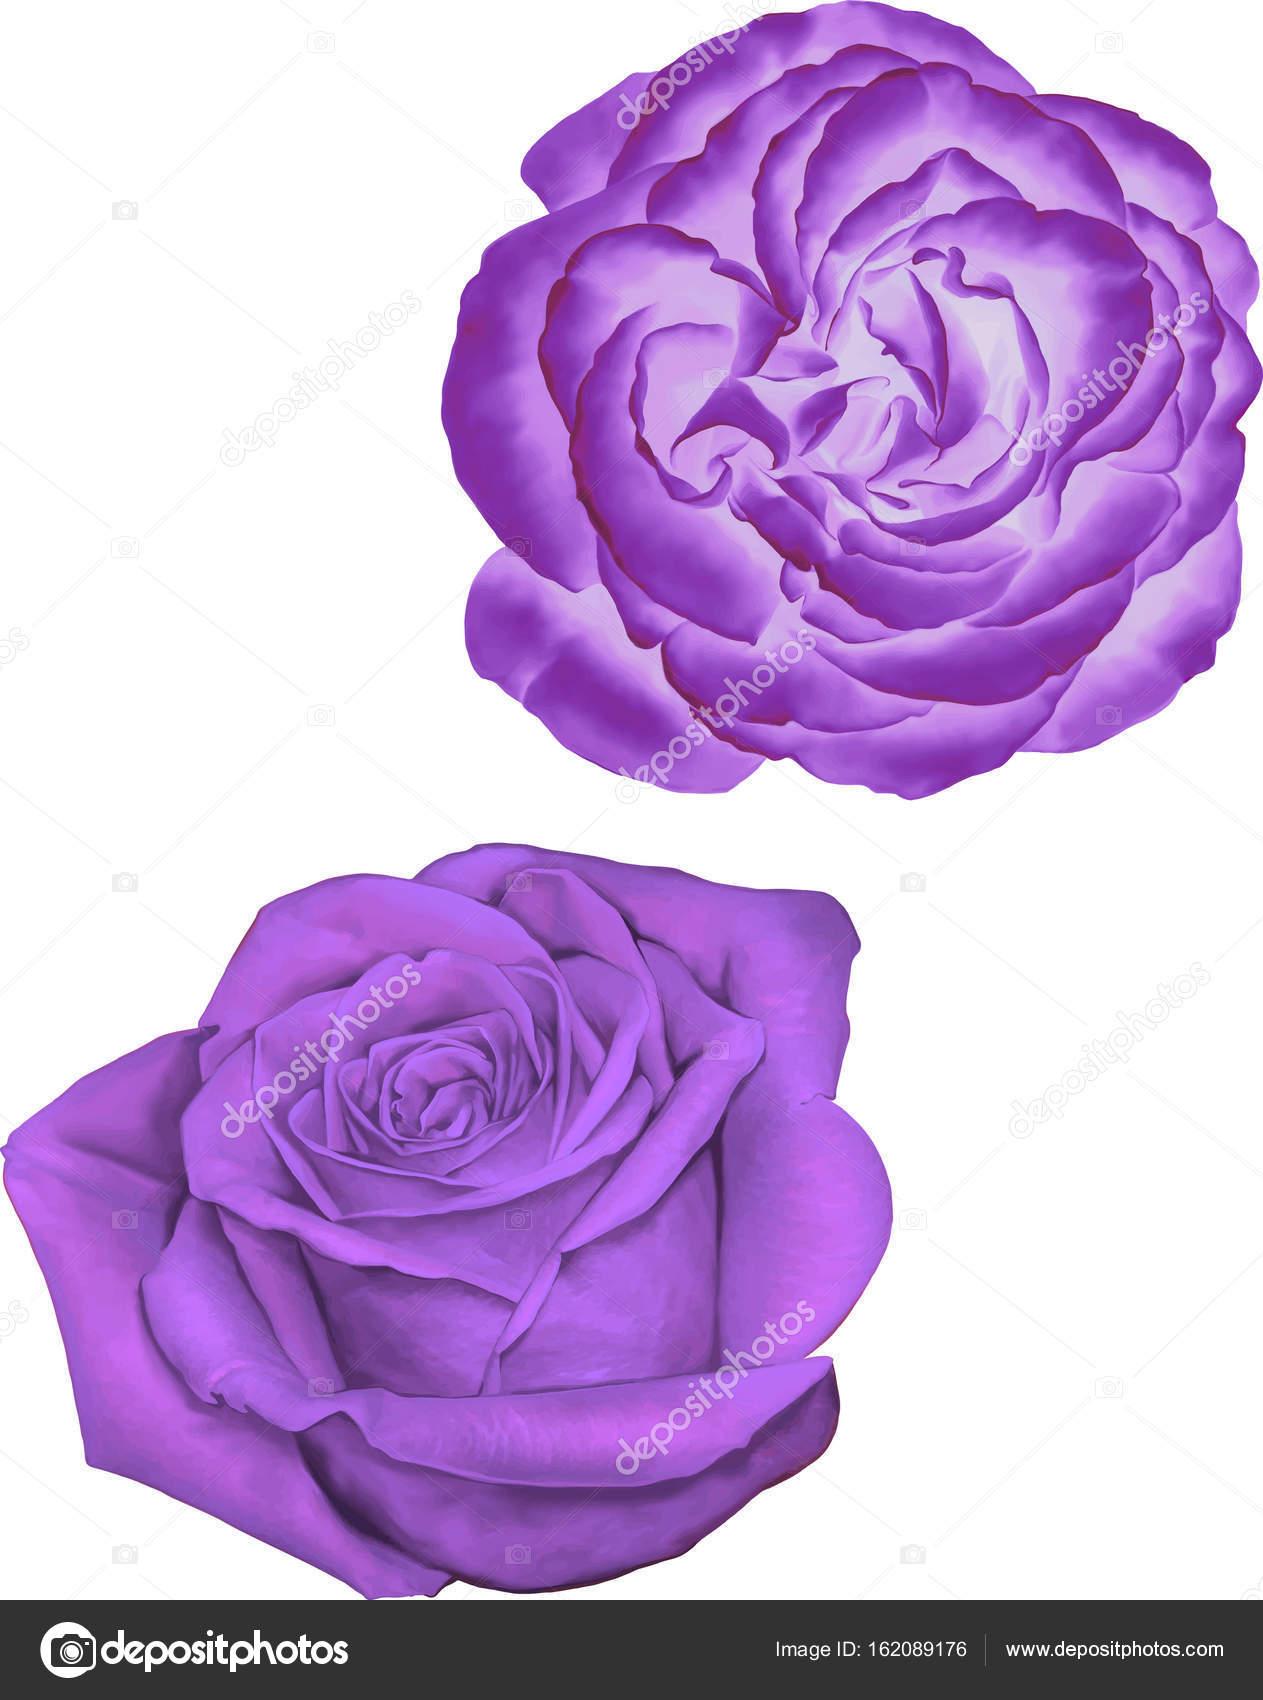 Beautiful Light Purple Rose Flowers Isolated On White Background Vector Illustration Photo By Artnature